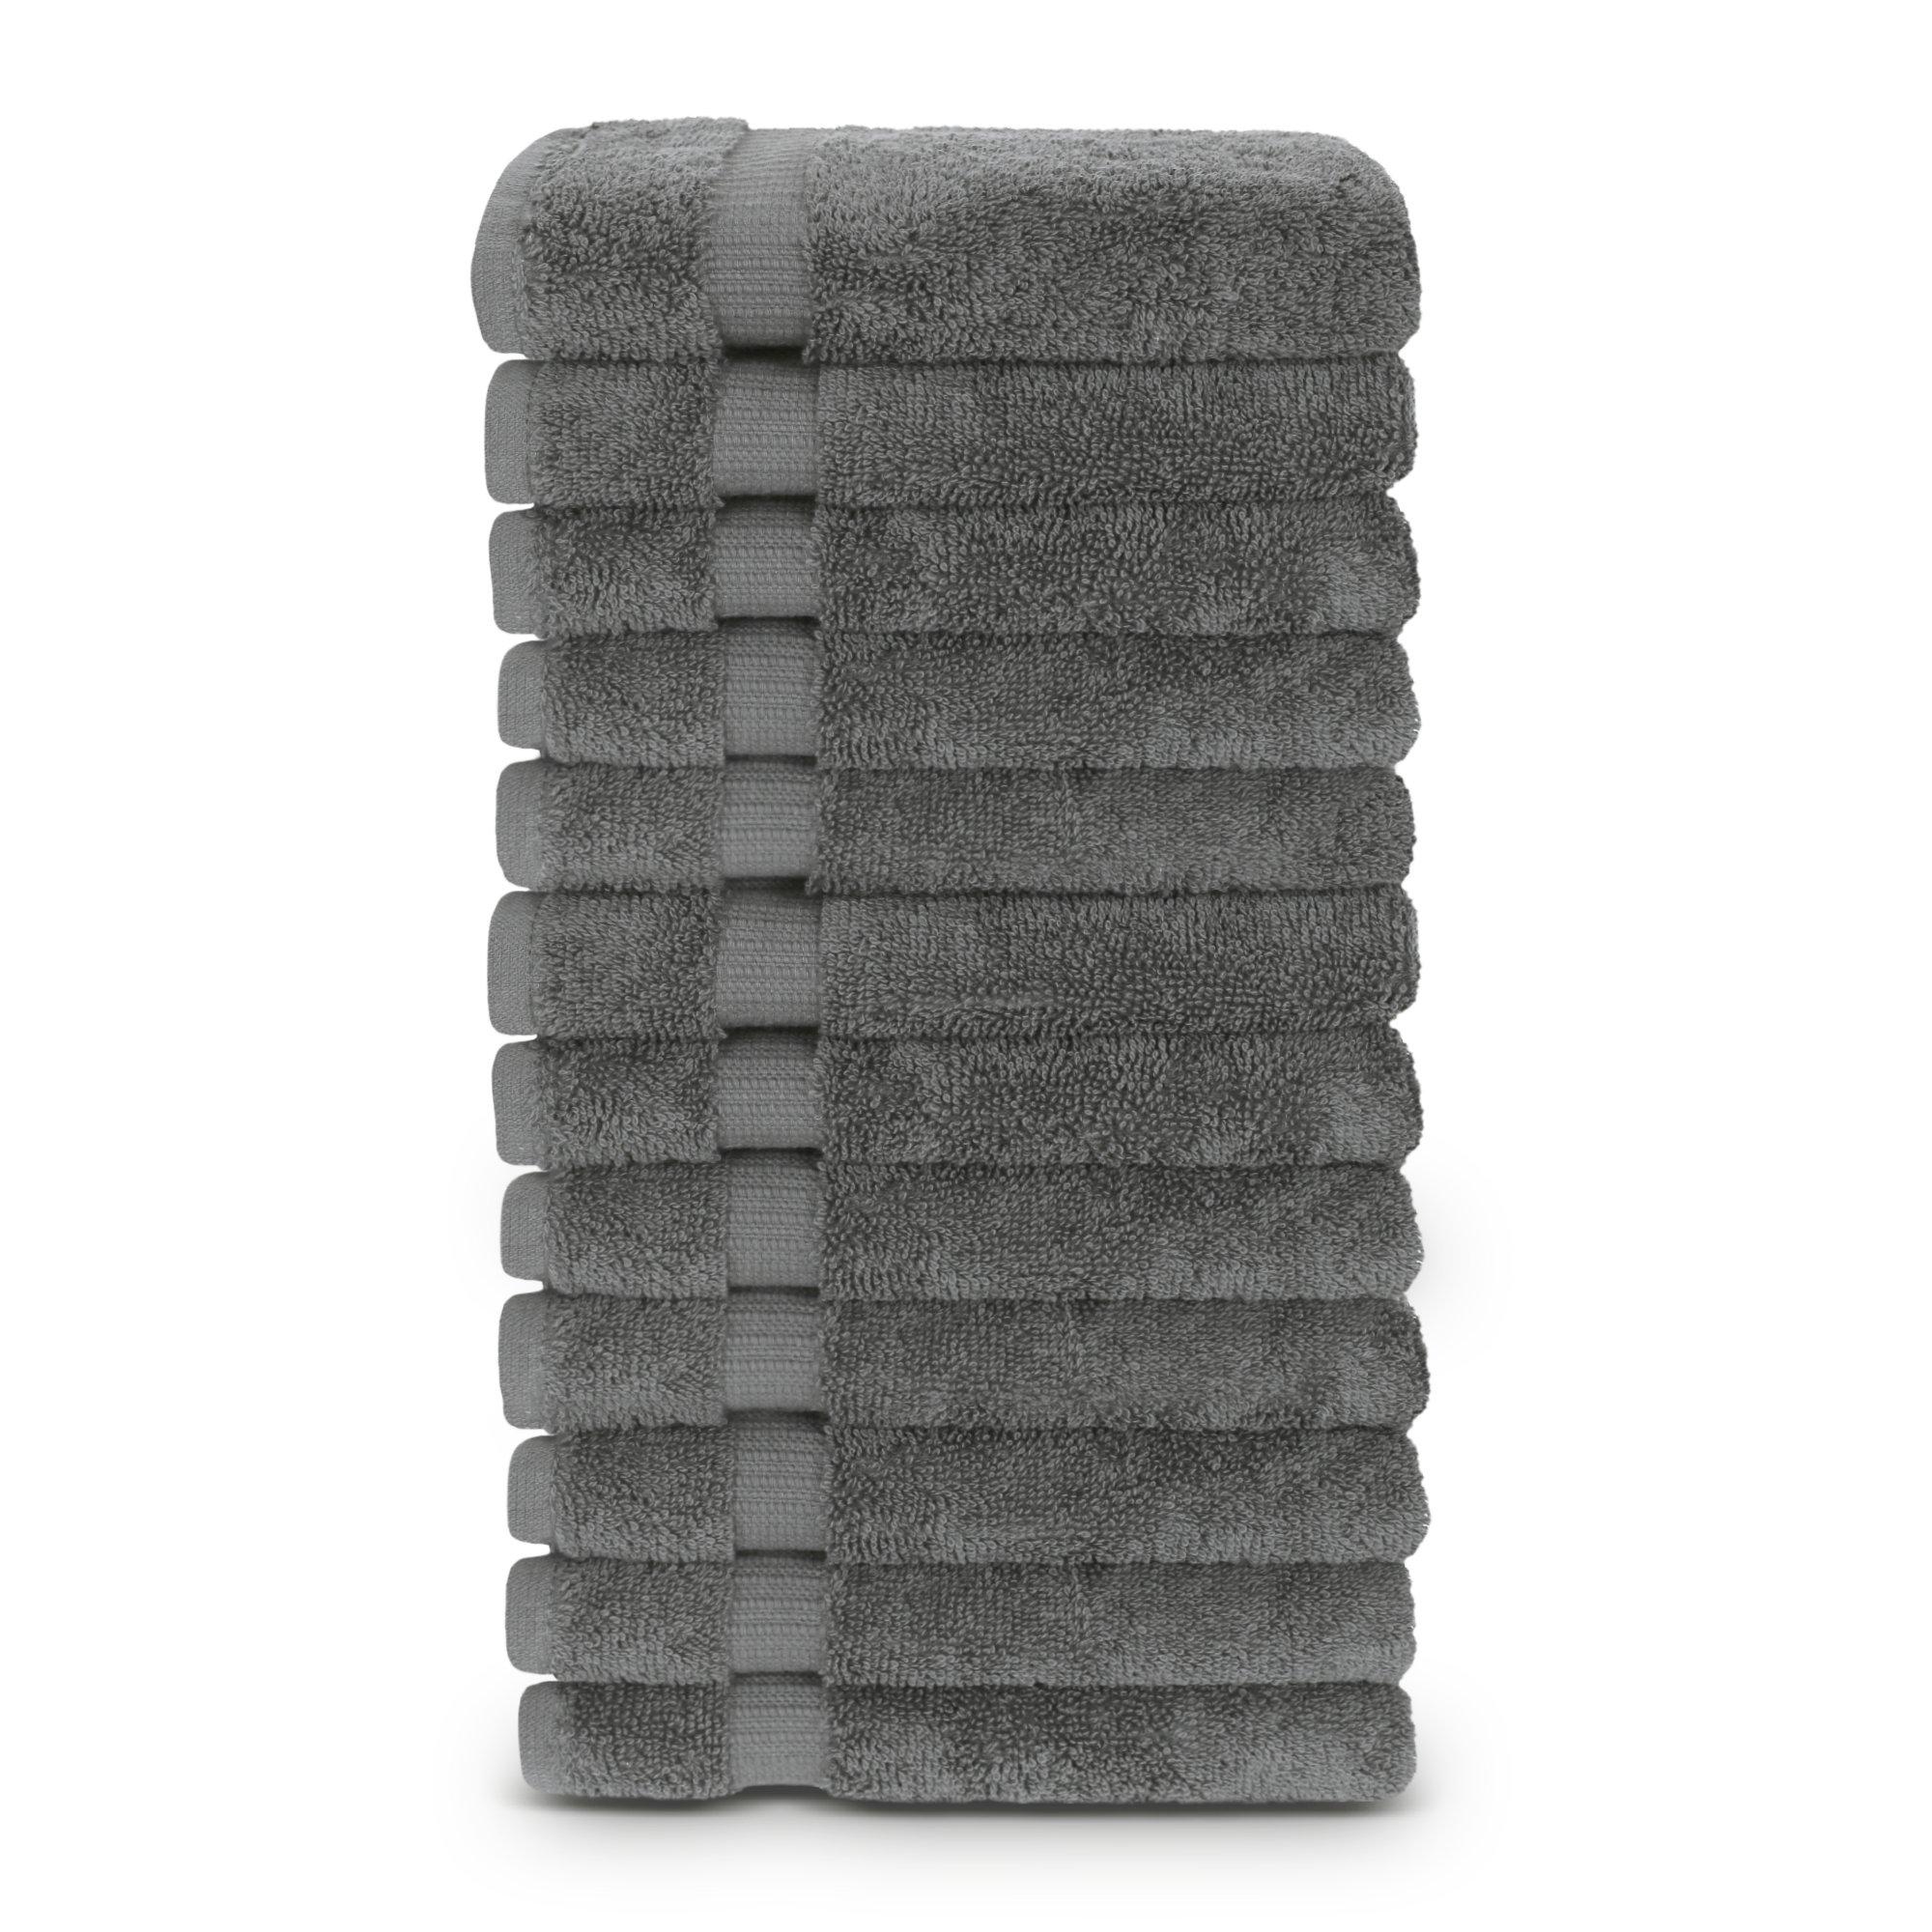 12-Piece Turkish Cotton Dobby Border Eco Friendly Face Towel/Washcloths Set by Turkuoise Turkish Towel (Gray)